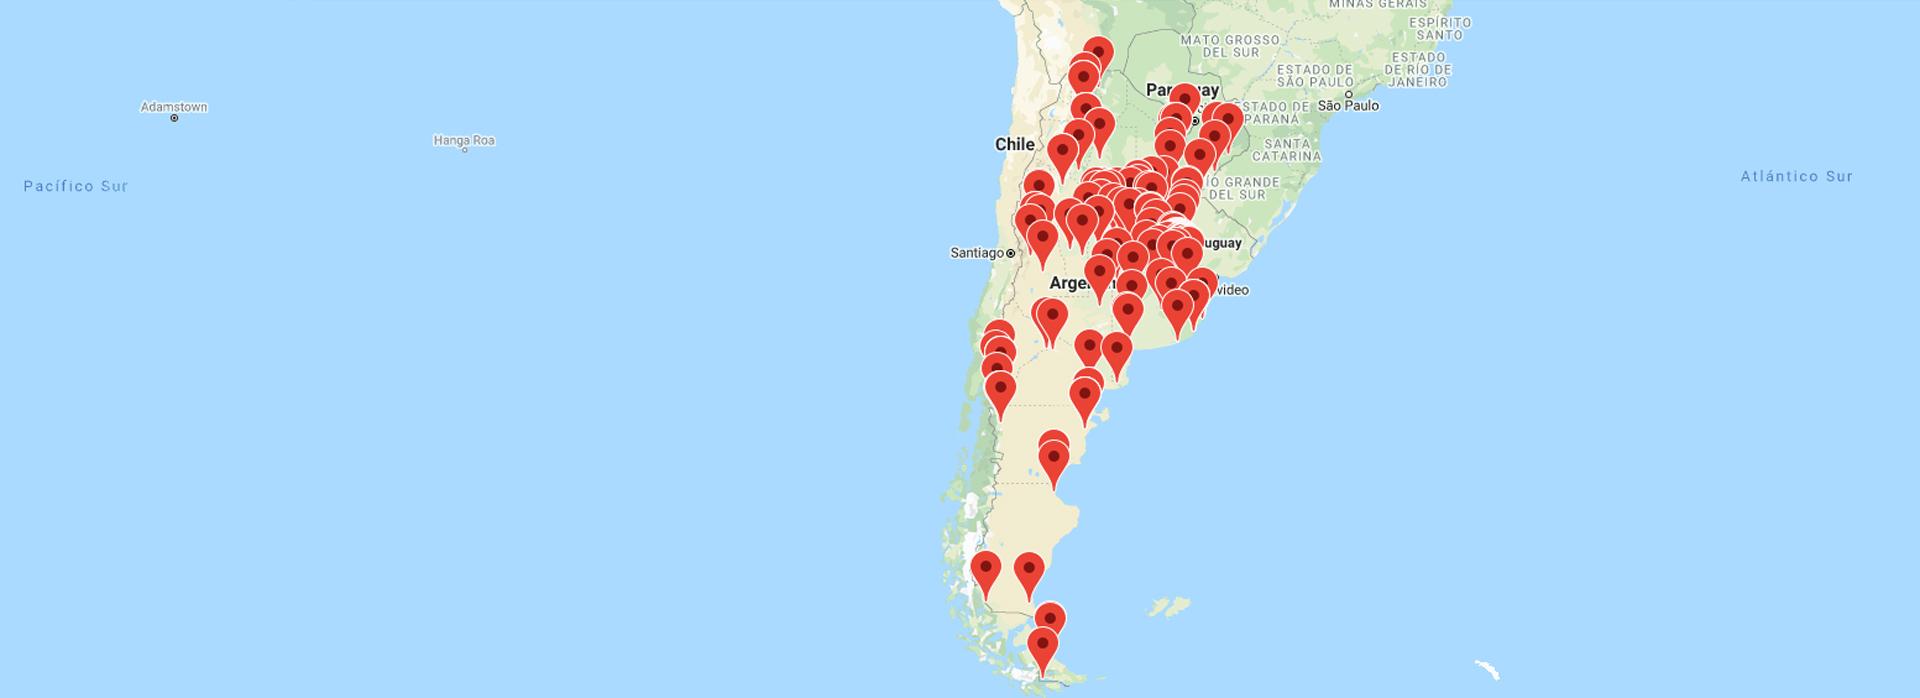 Amplia cobertura en toda la República Argentina